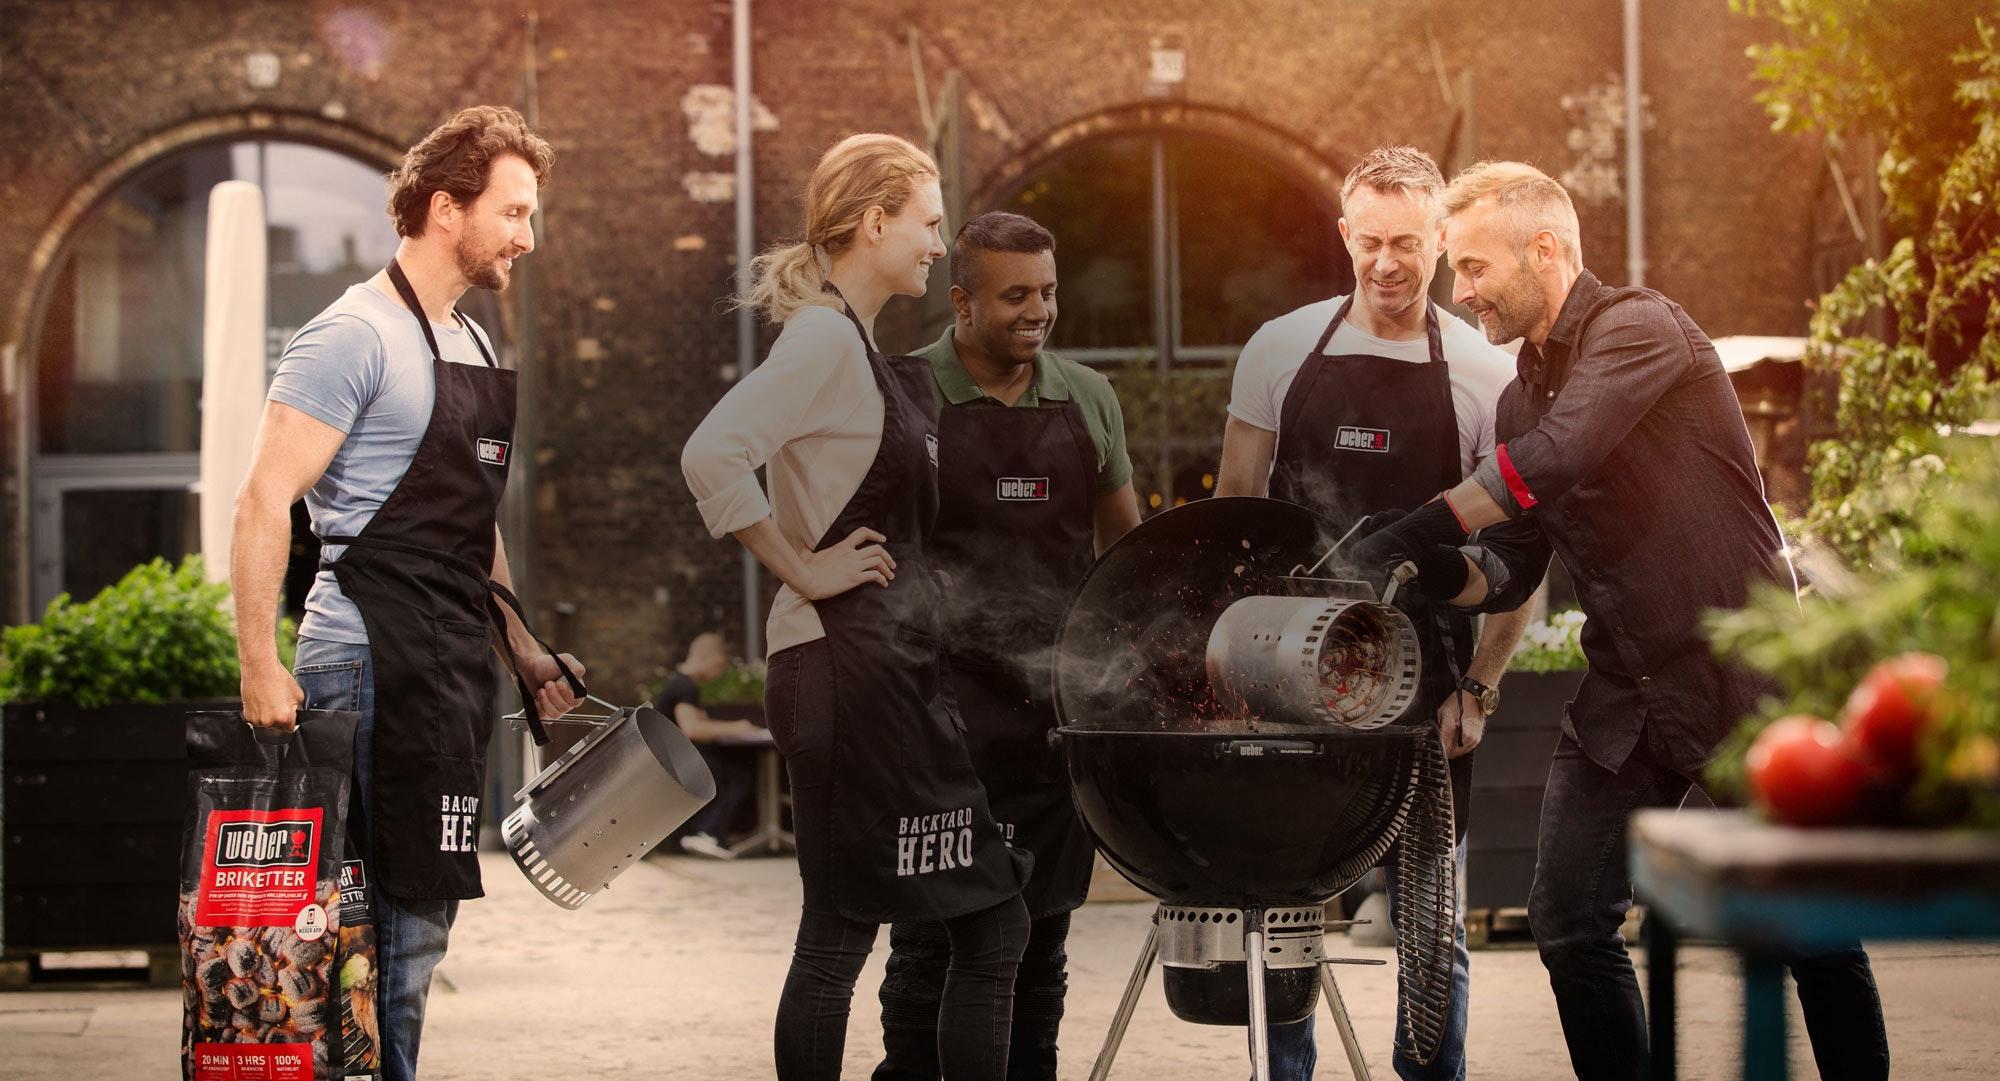 Kom på grillkursus i hele Danmark